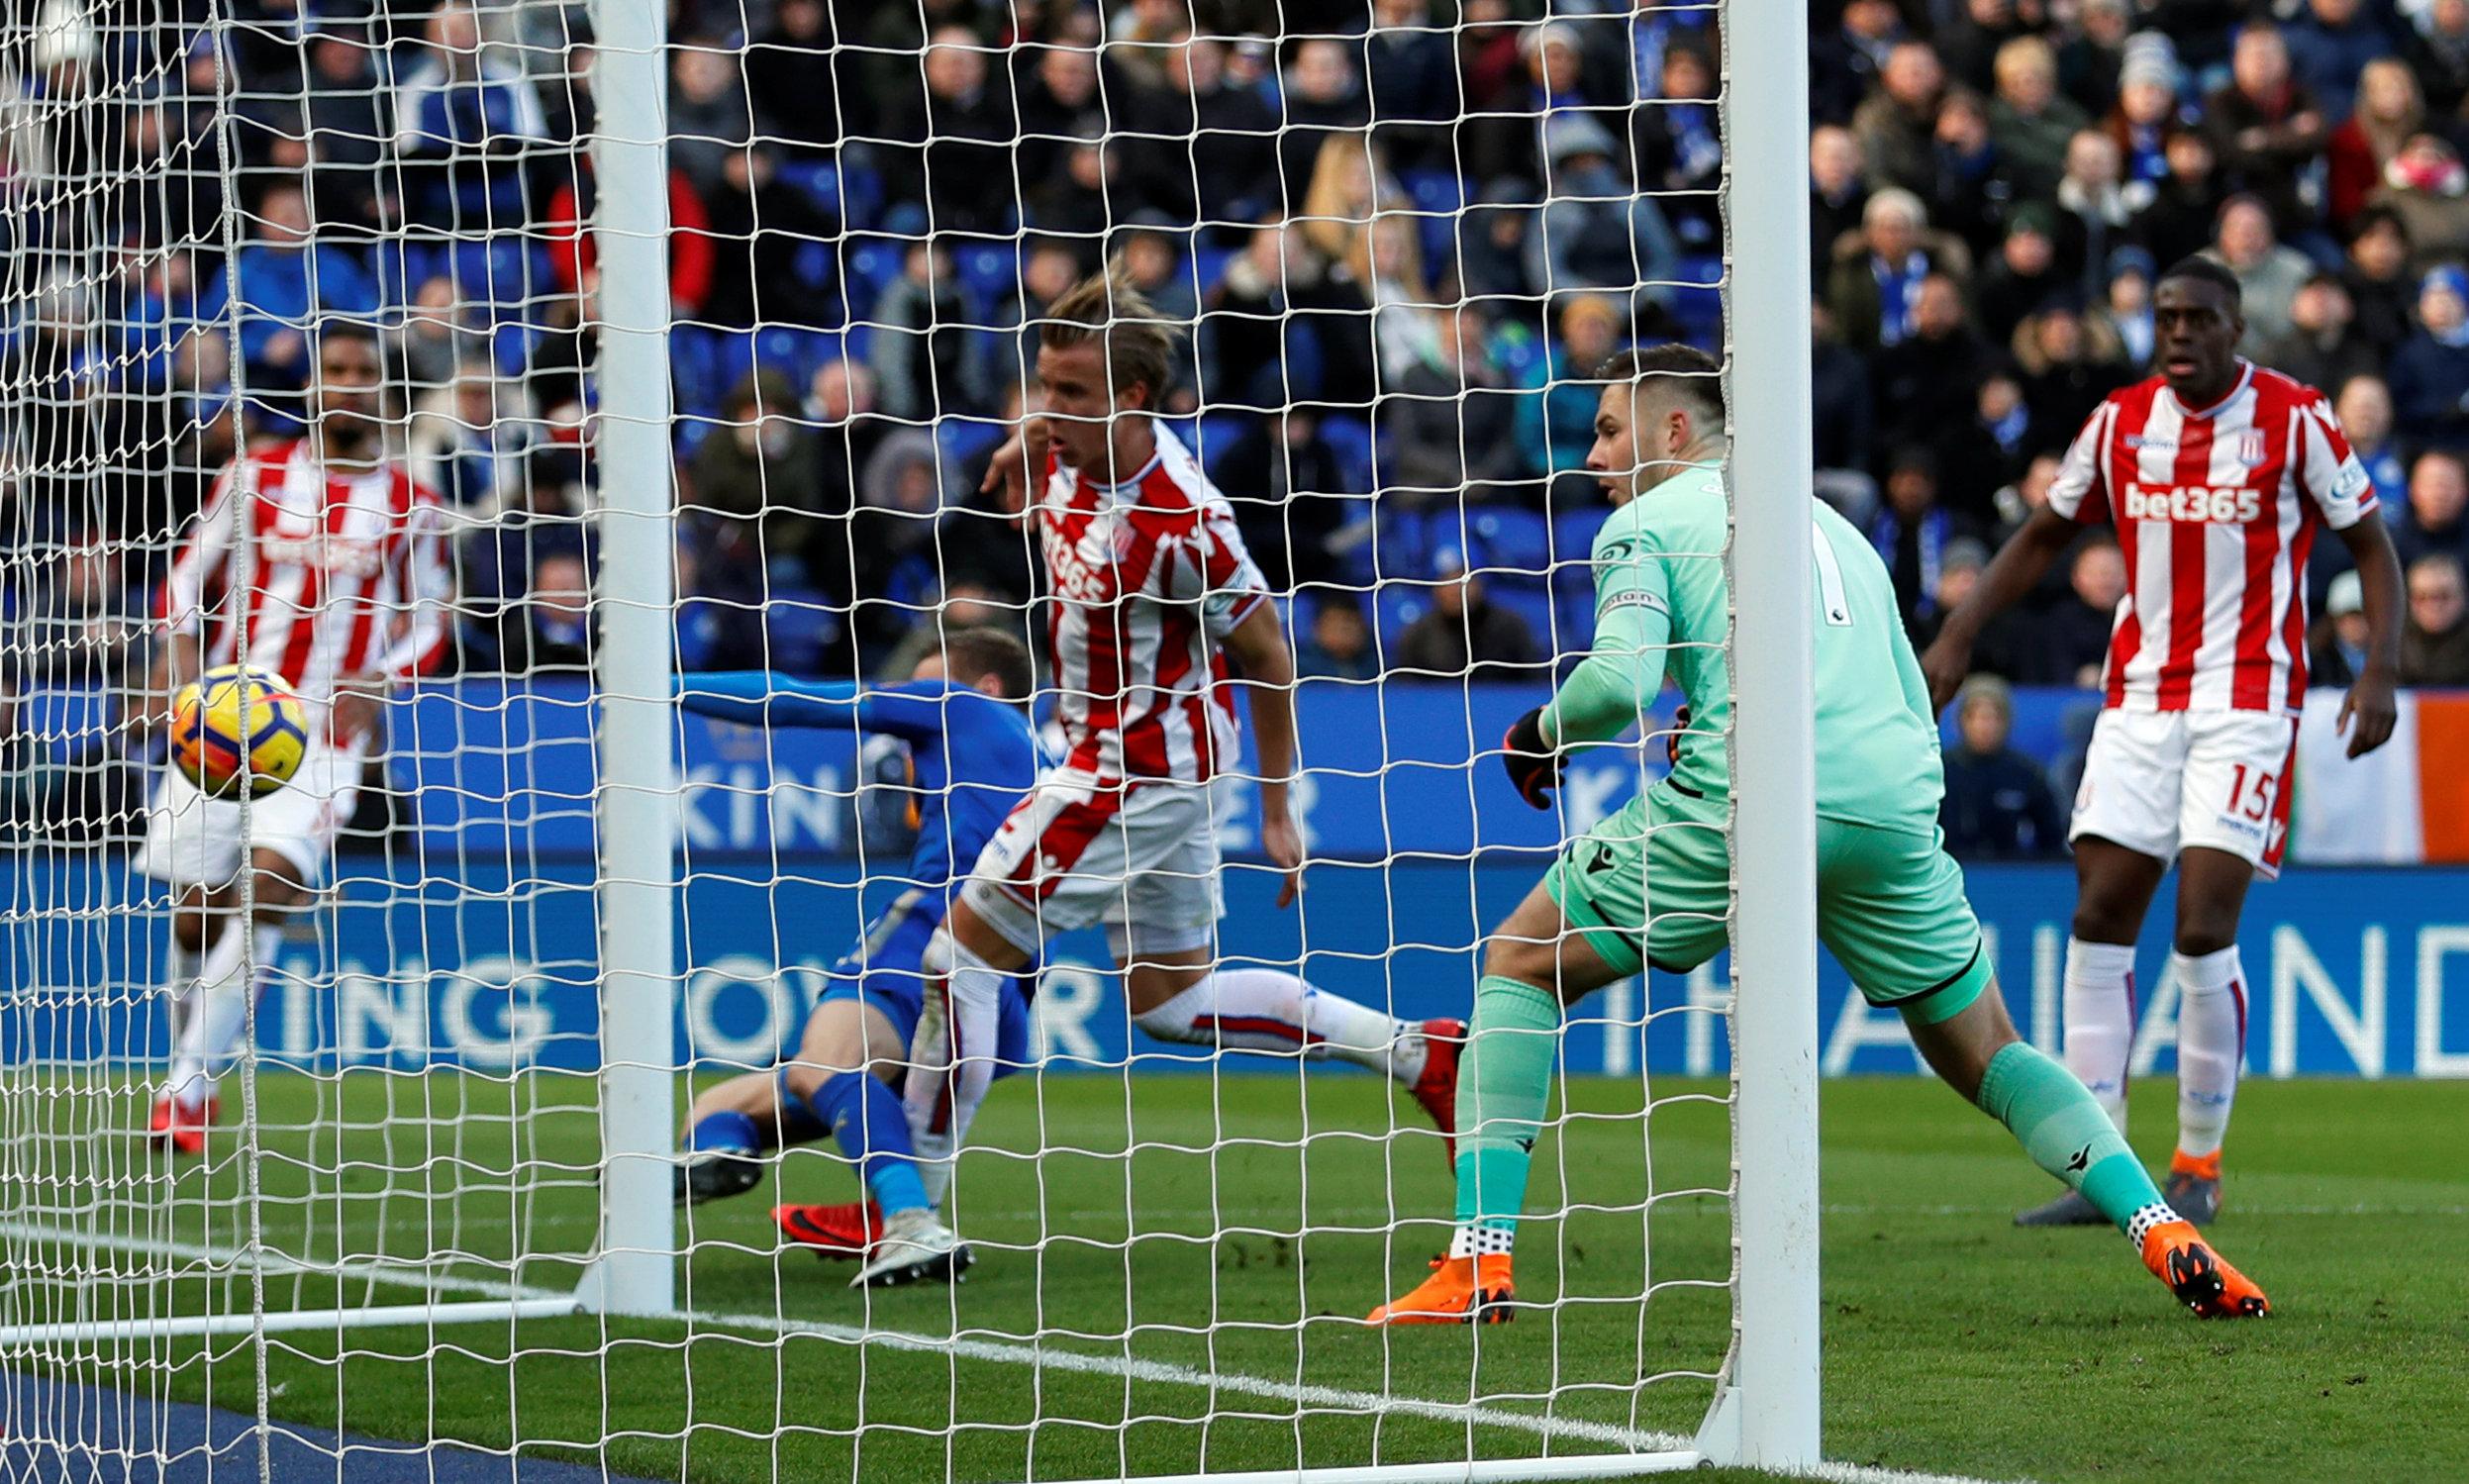 Football: Butland howler gifts Leicester an equaliser